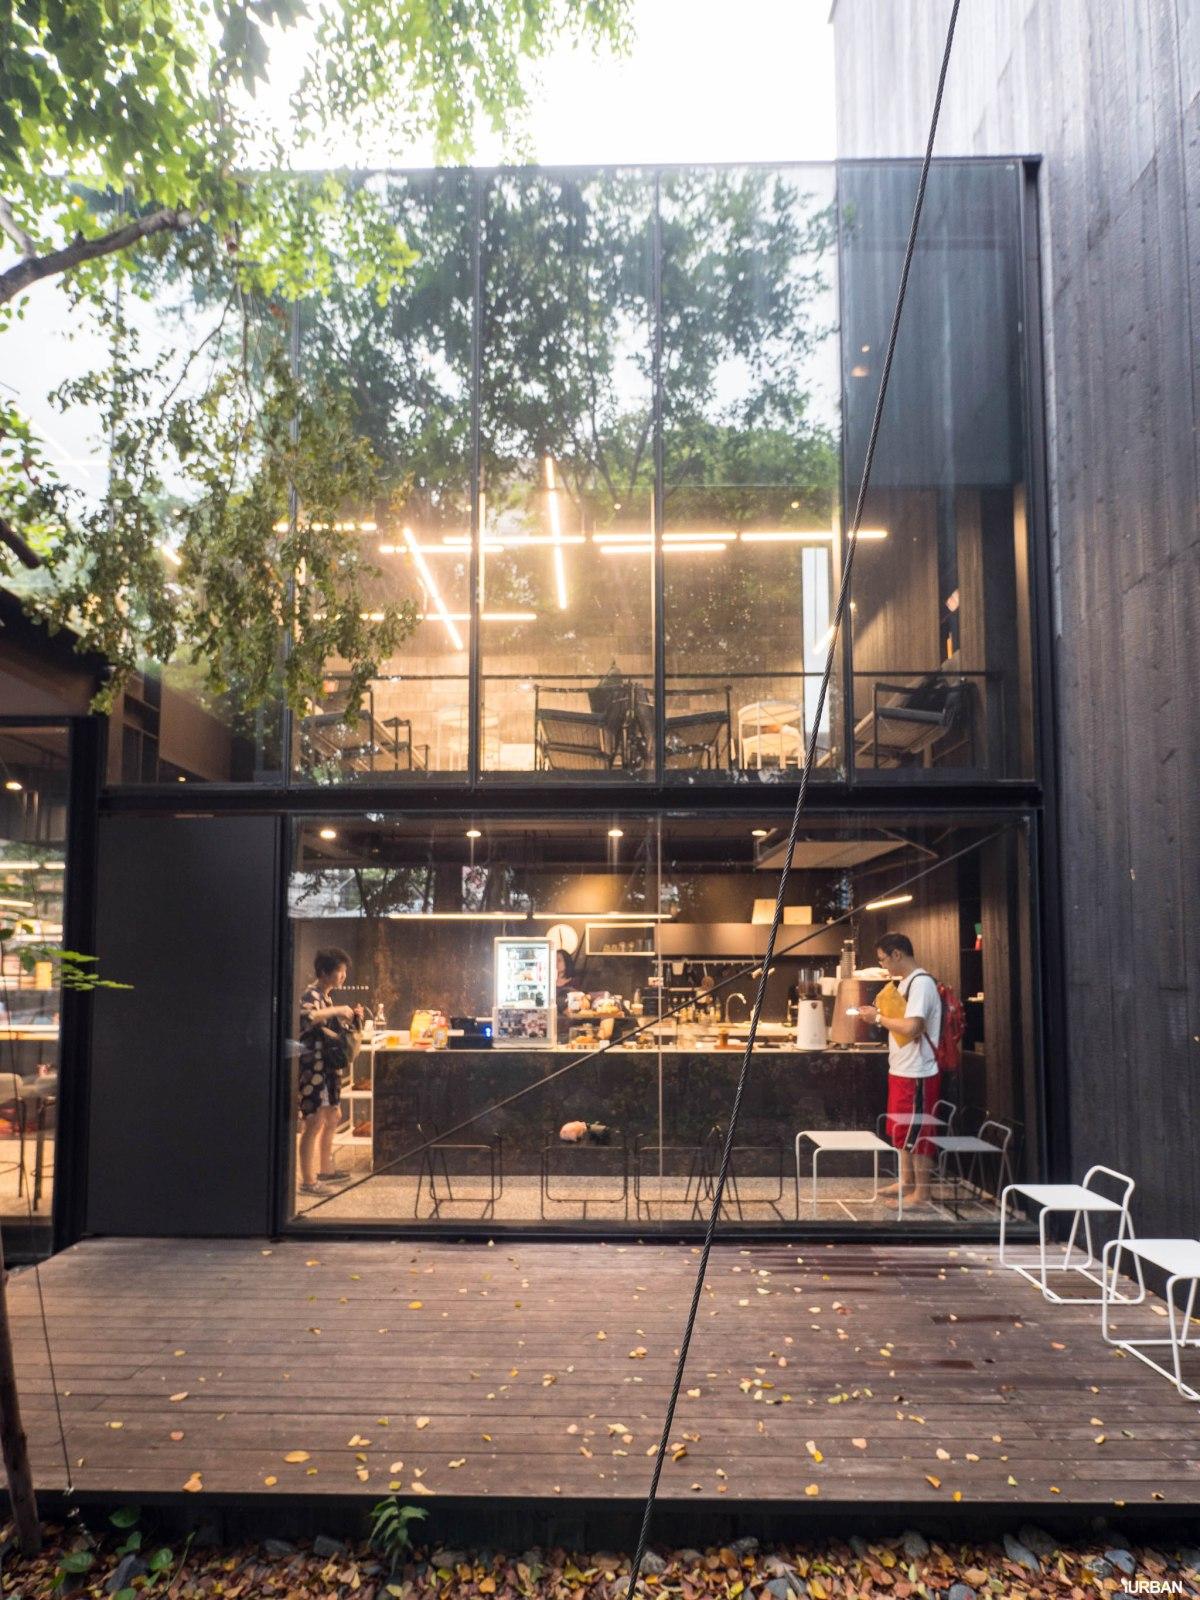 MODERNISM: ARCHITECT CAFE คาเฟ่ที่จะทำให้คุณได้ทึ่งพร้อมสัมผัสของจริงกับงานสถาปัตยกรรมสไตล์ modern 14 -